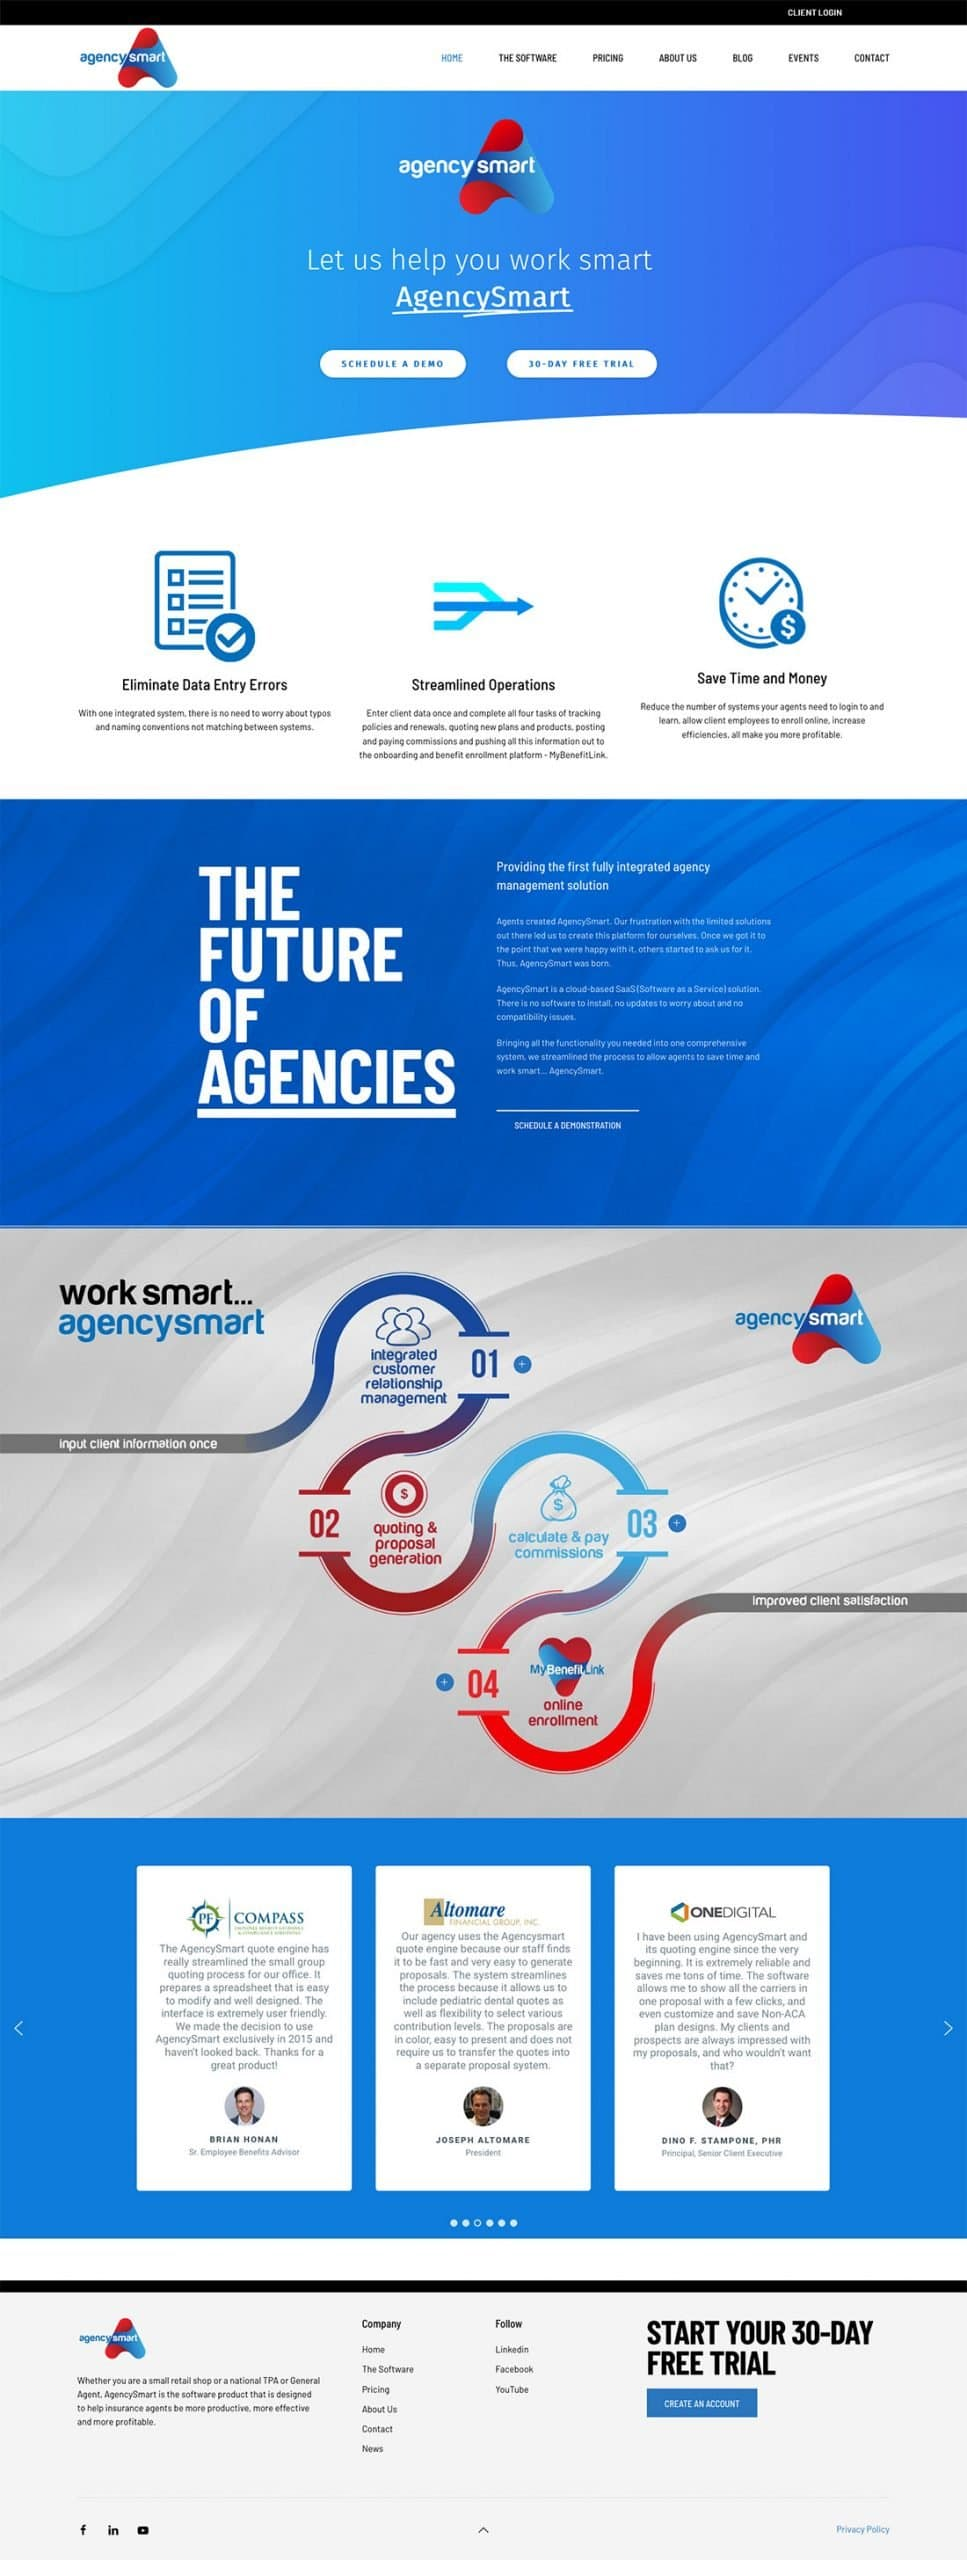 agency smart website design nj